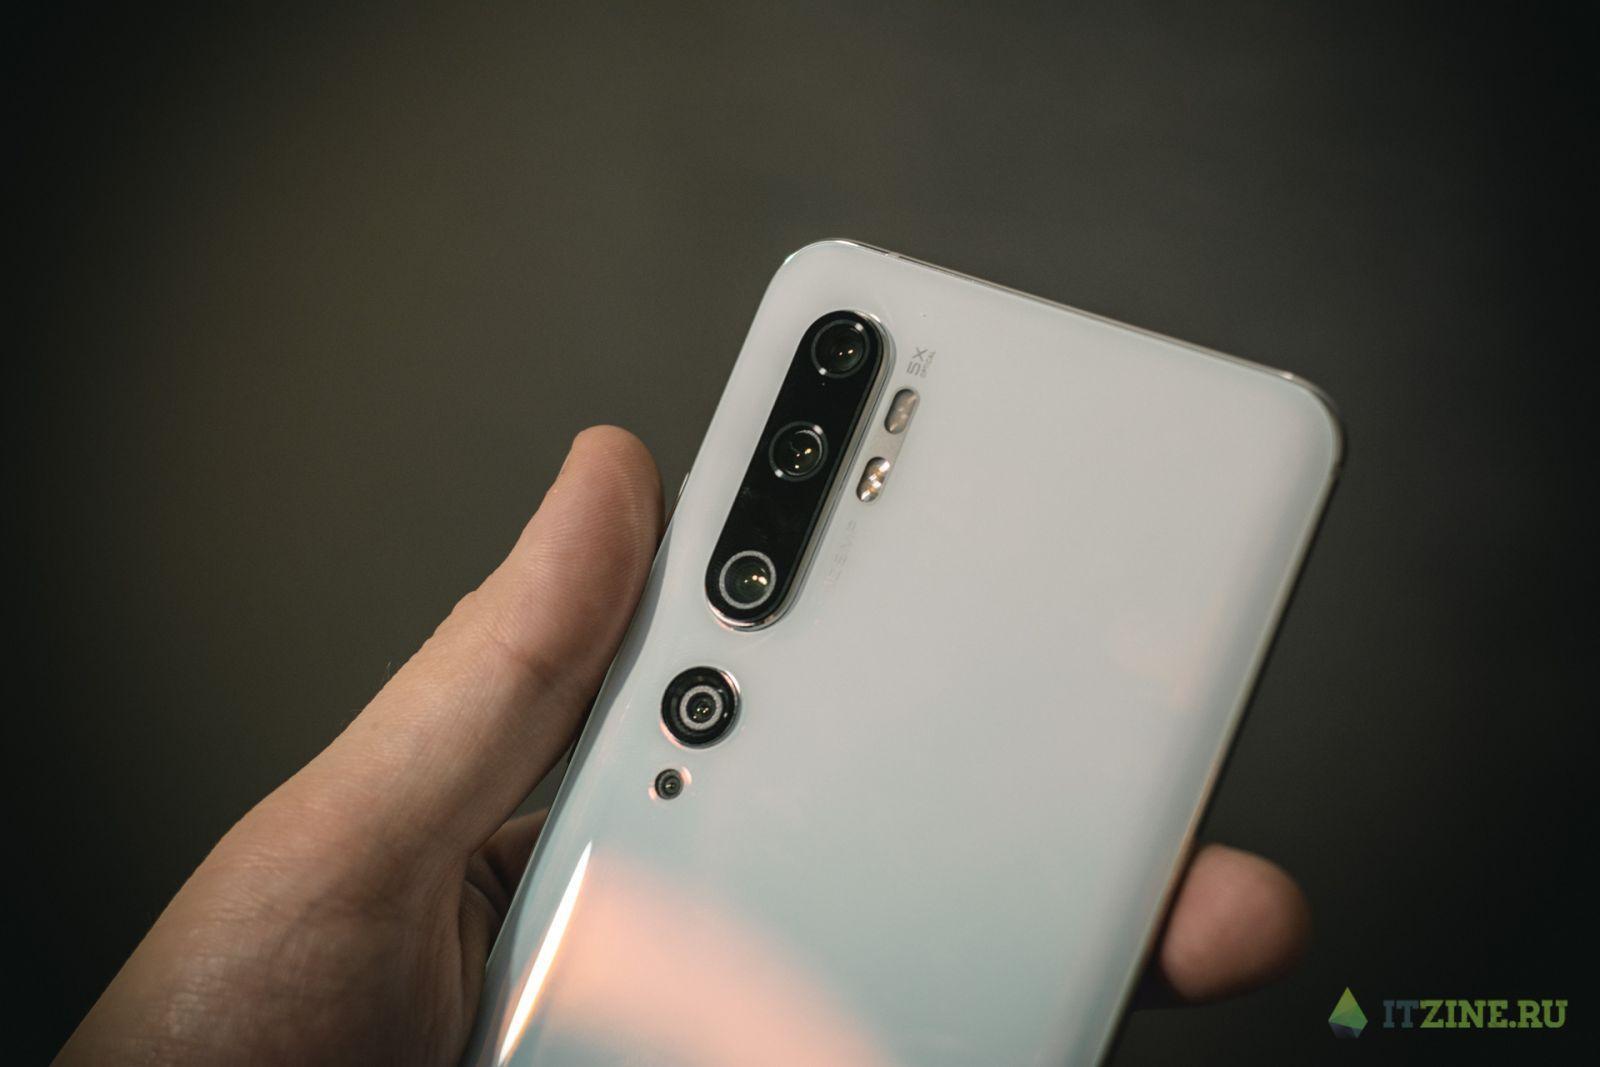 Обзор Xiaomi Mi Note 10 Pro. Добротный флагман (dsc 8122)